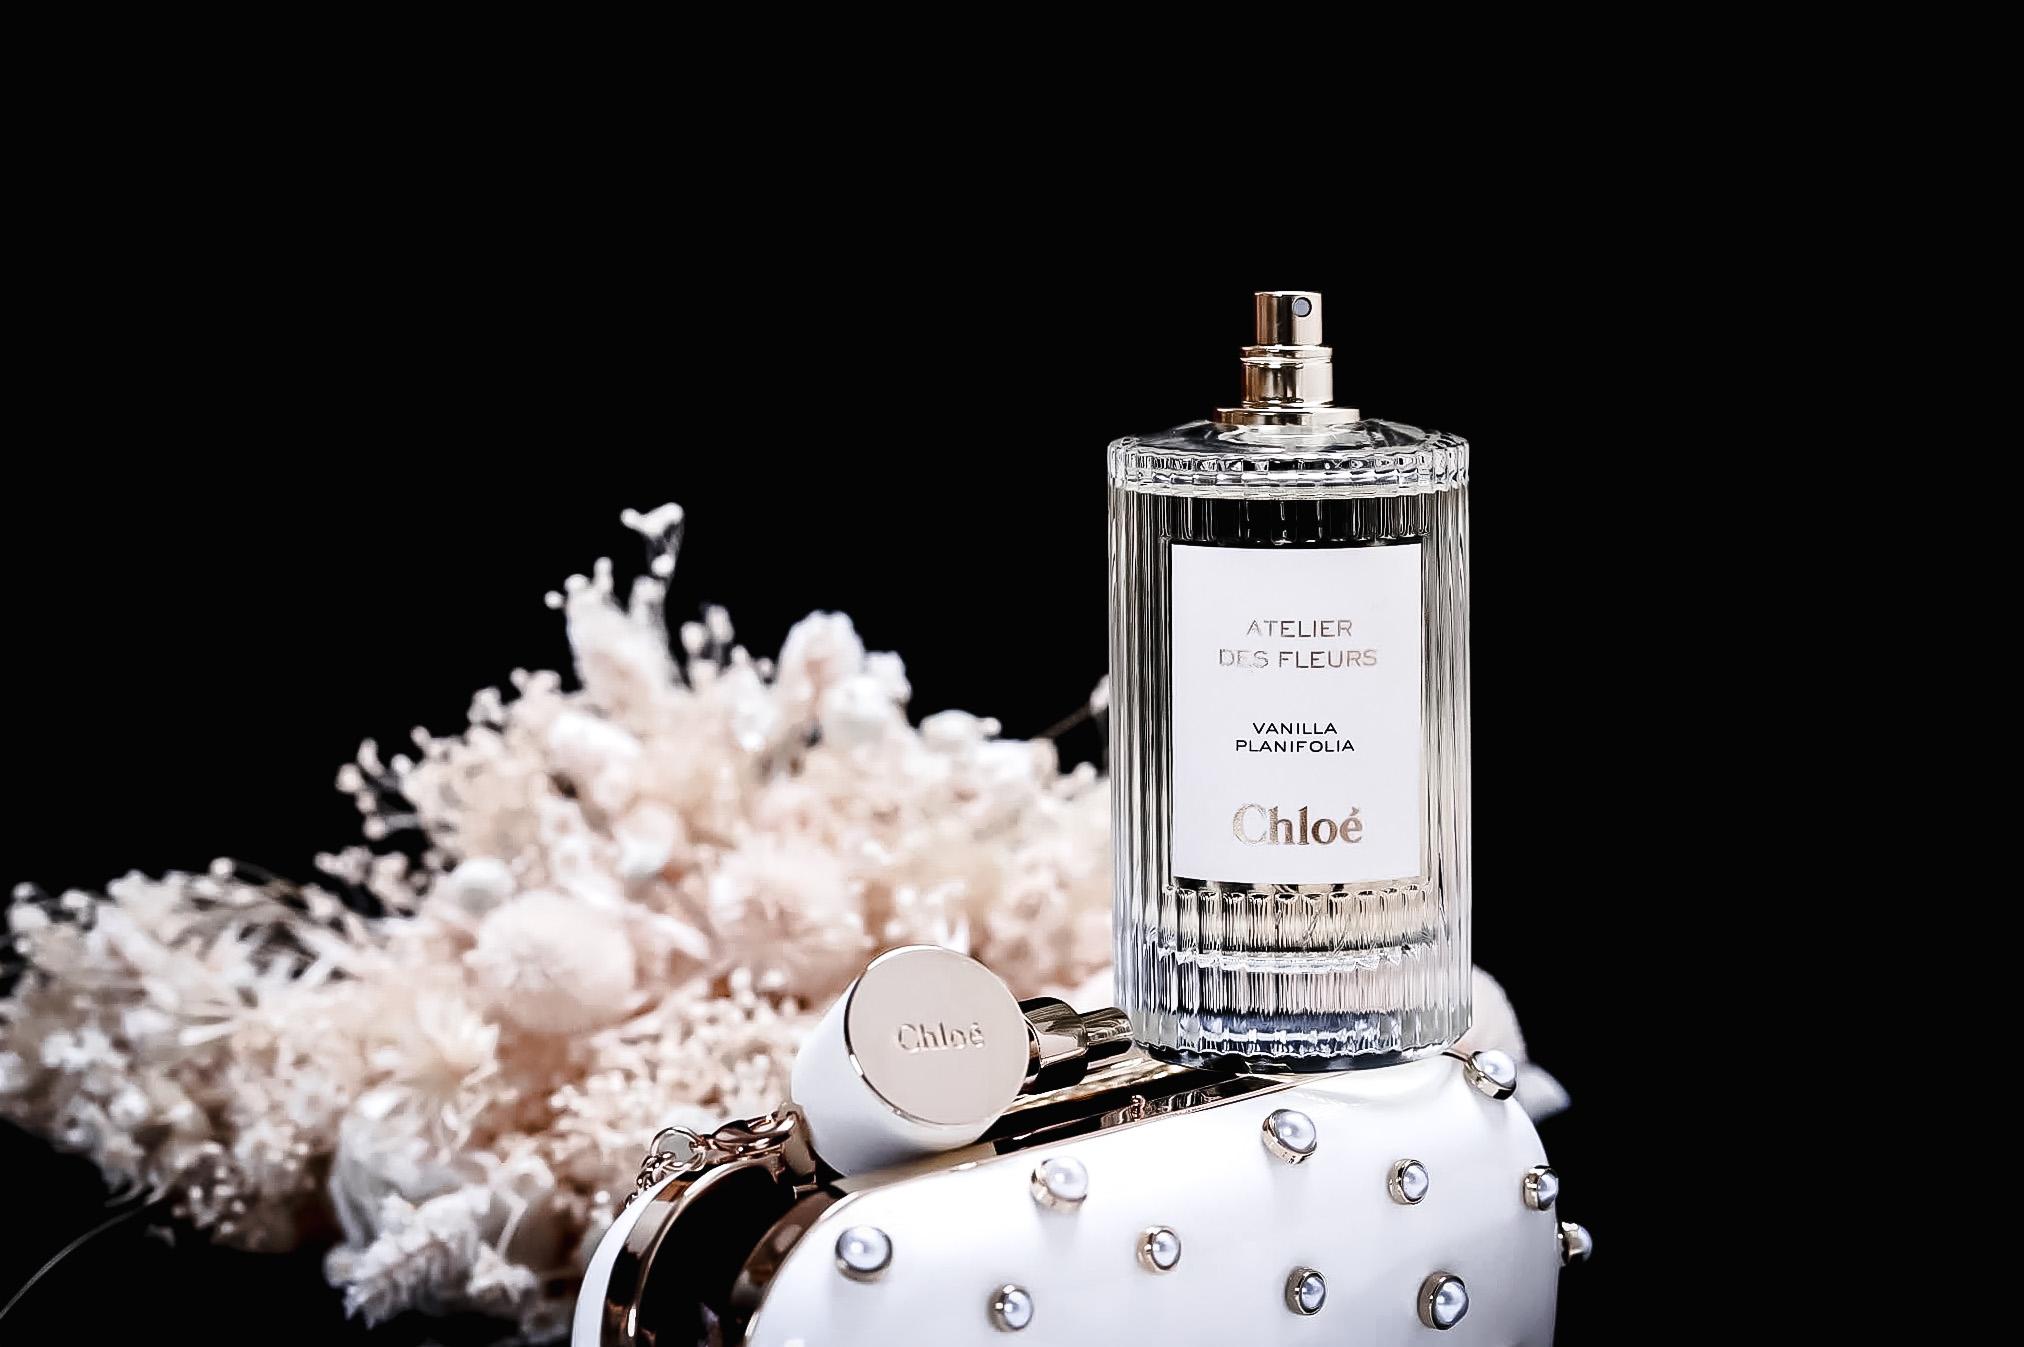 Chloé Atelier des Fleurs Vanilla Planifolia